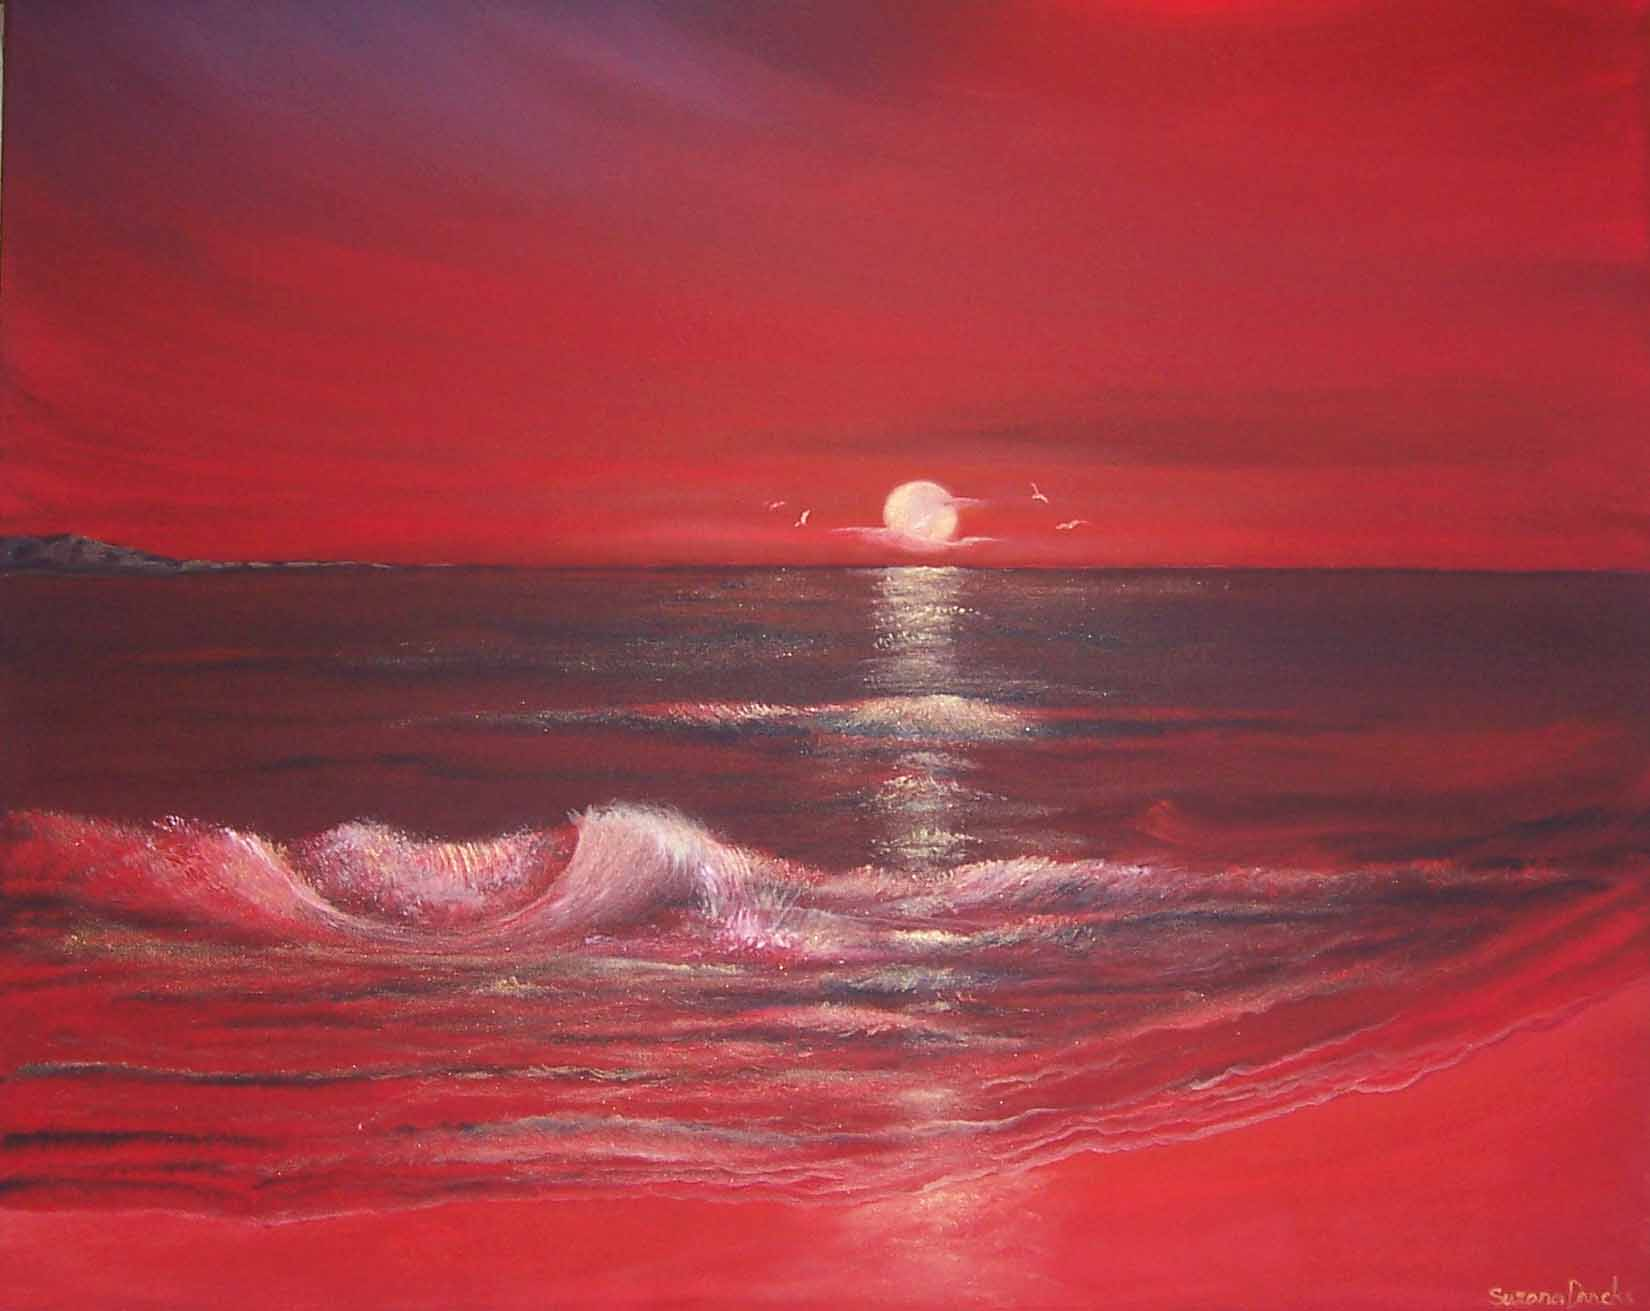 SCARLET OCEAN SUNSET